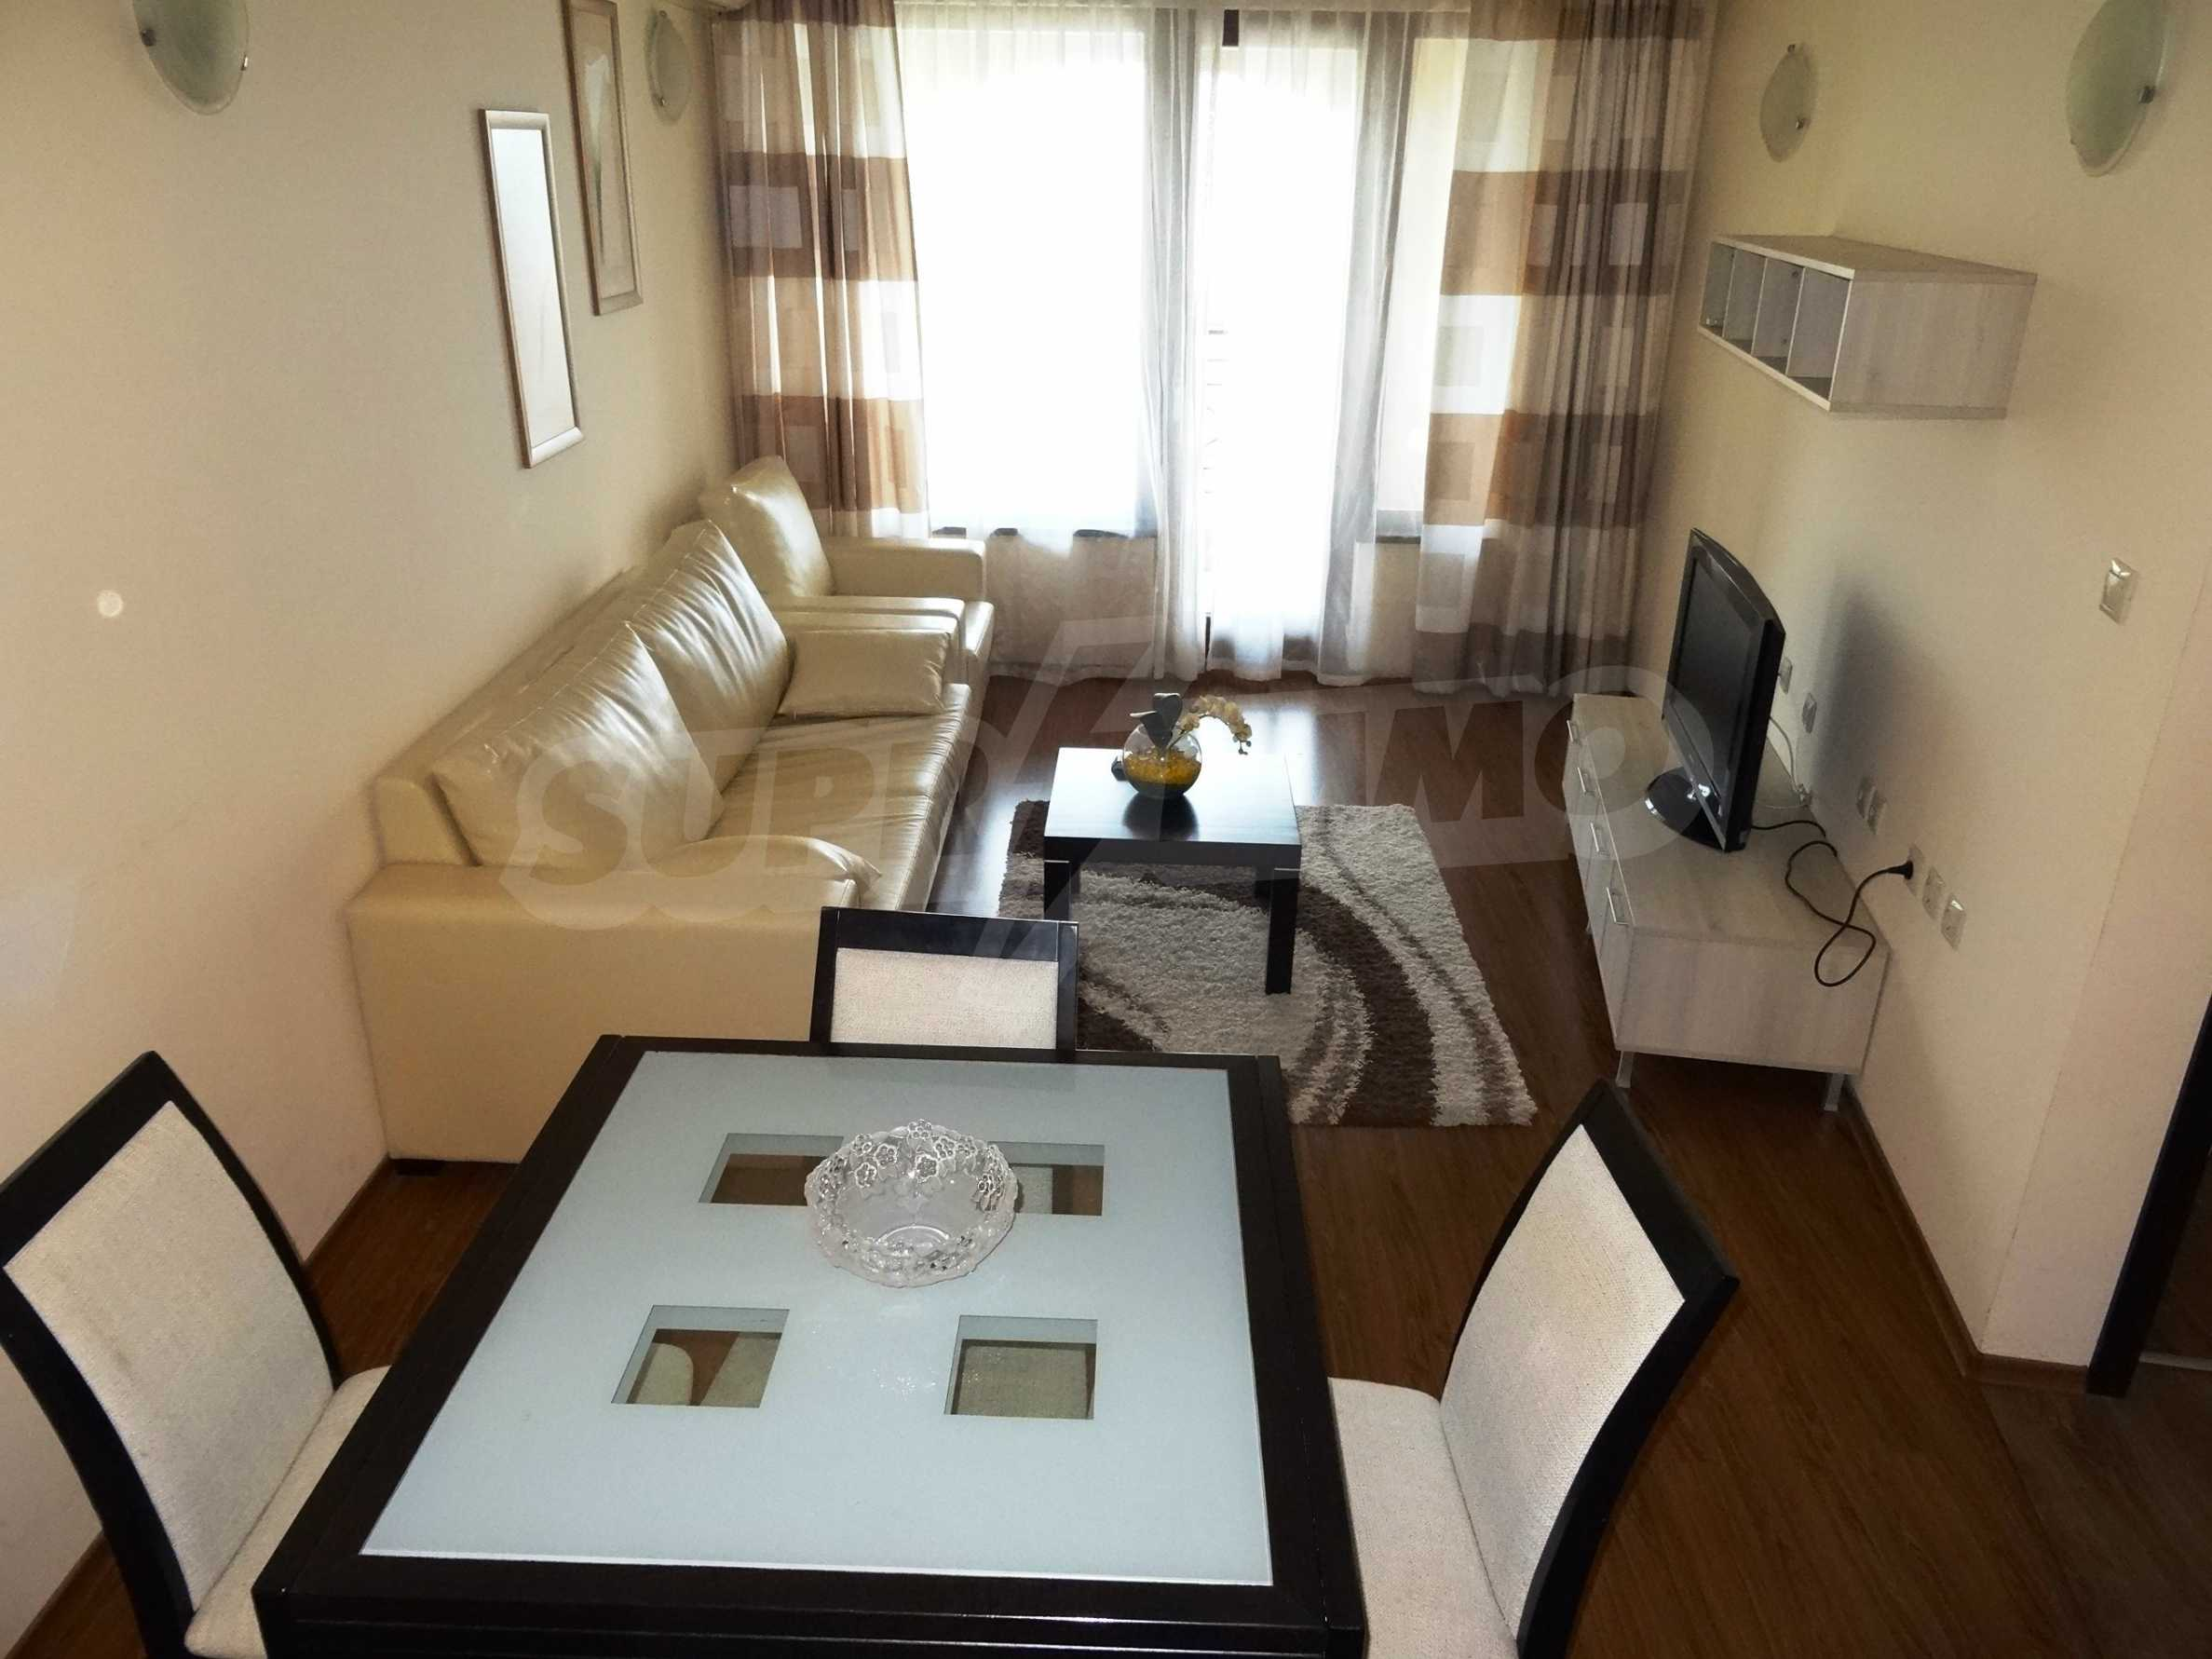 1-bedroom apartment Duralek  7